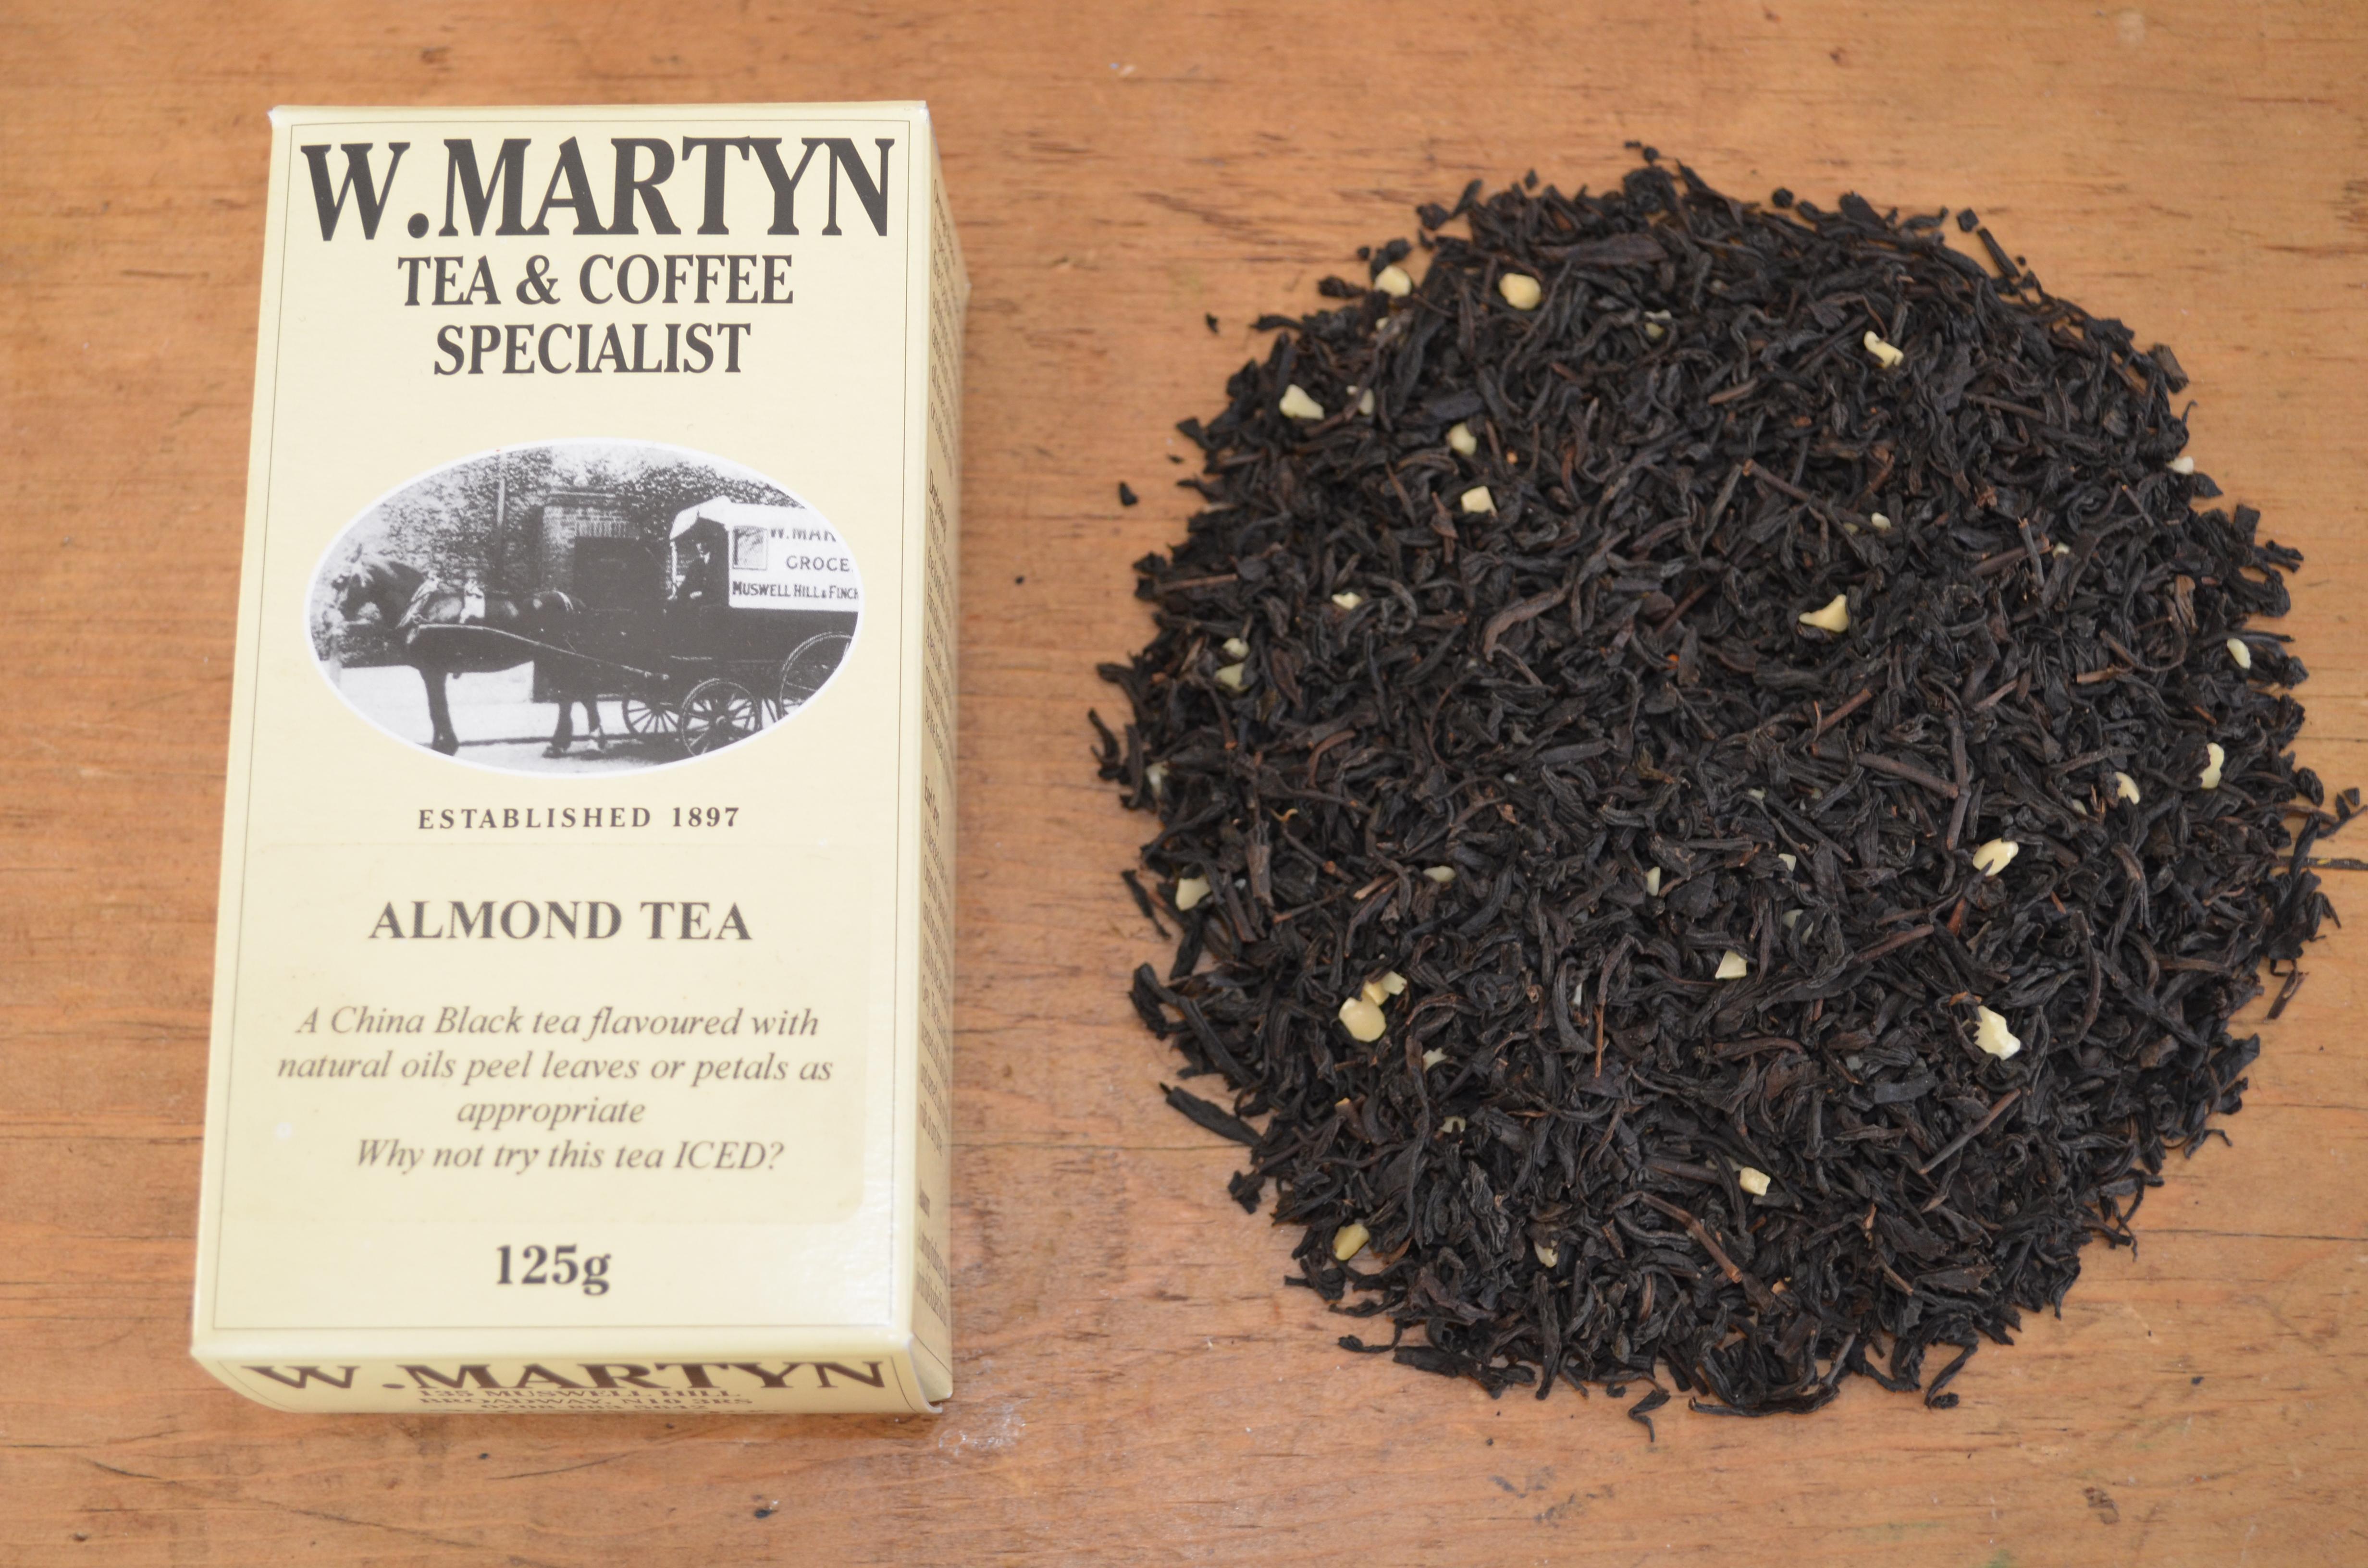 WMartyn Almond Tea